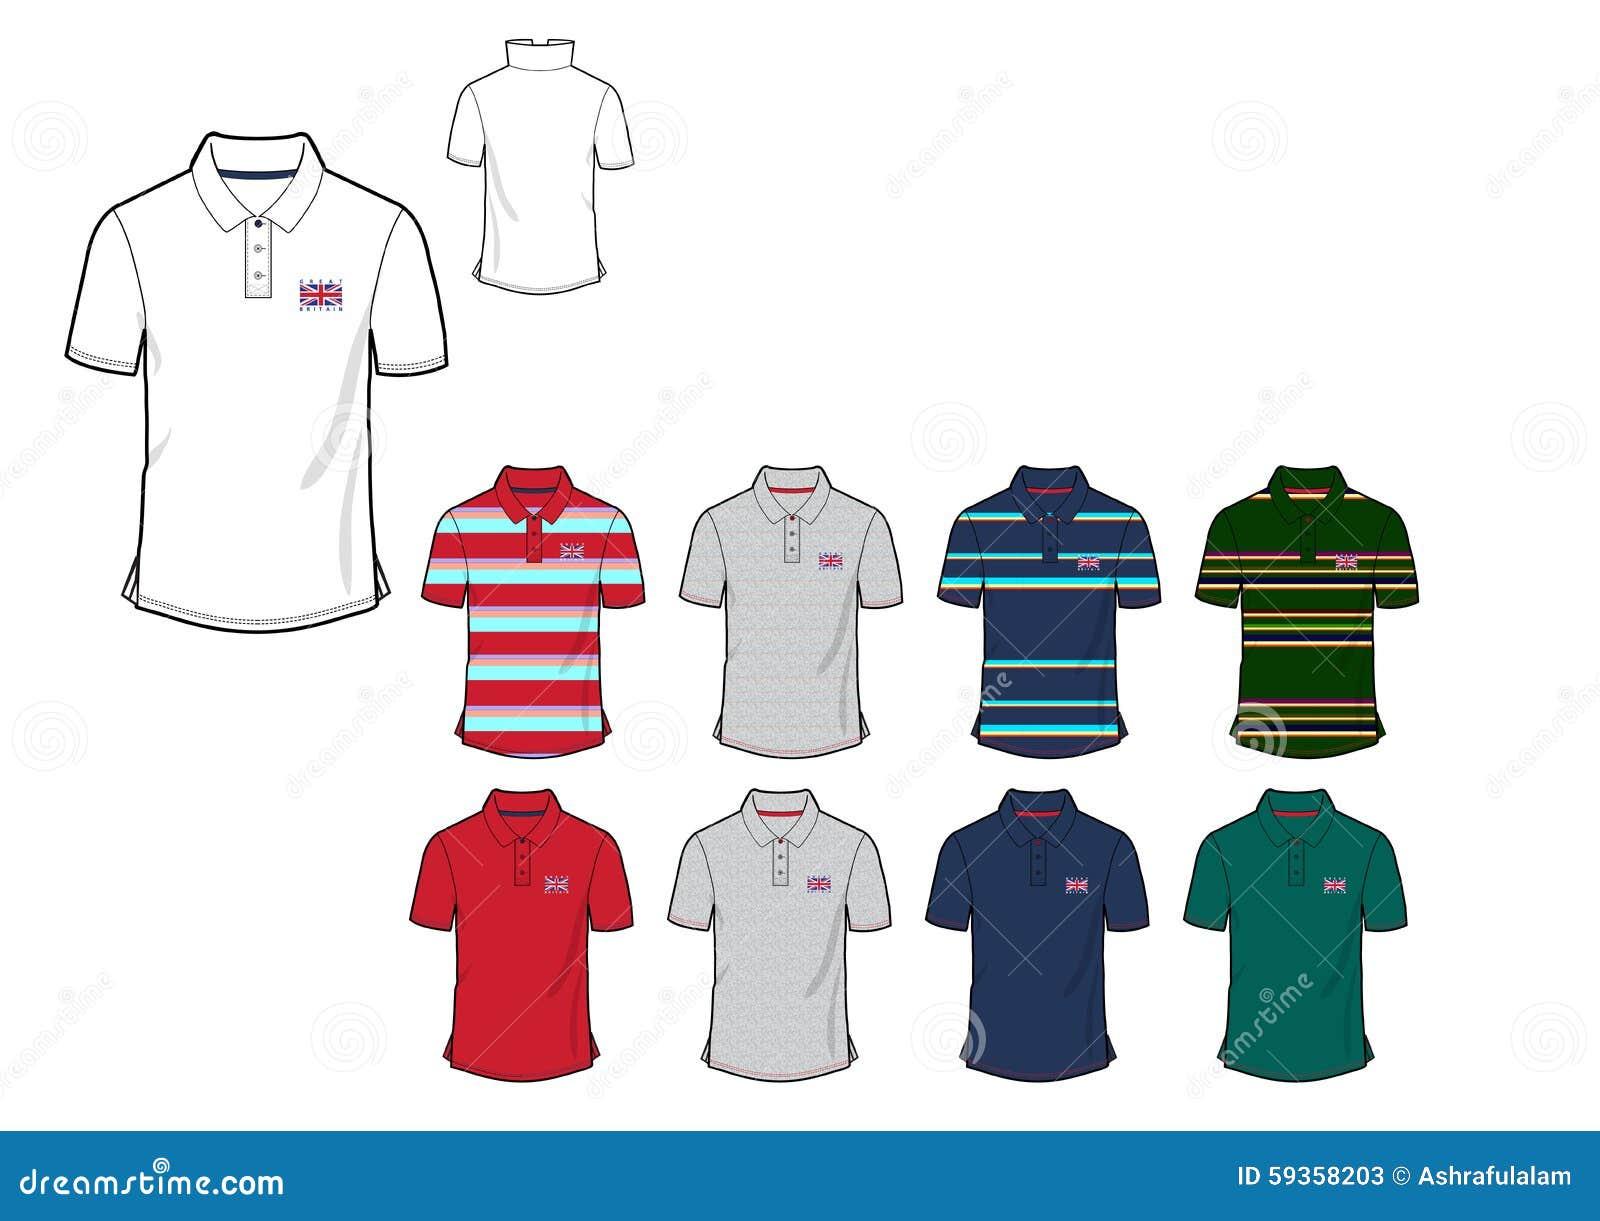 Design shirt v neck - Template Of Great Britten Mans Flag Polo Shirt Design Design Stock Photos